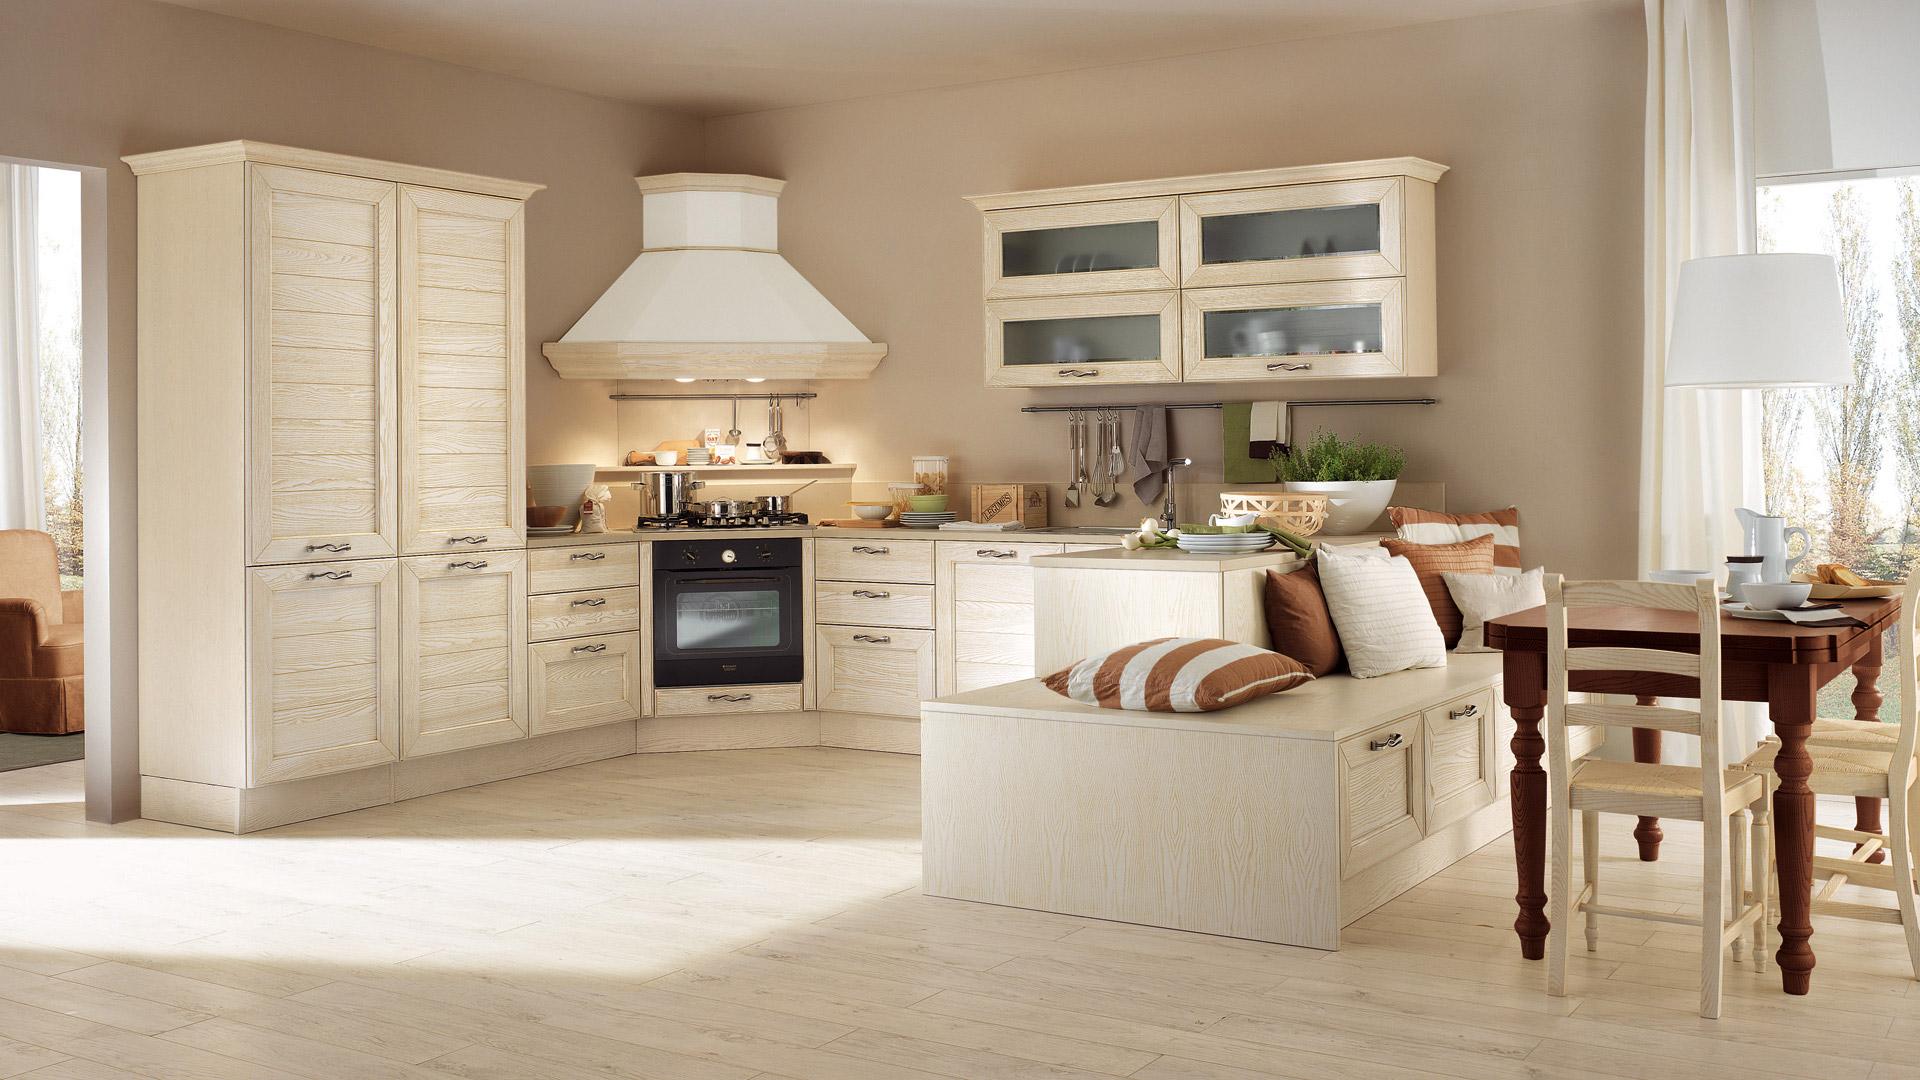 Cucina Classica Lube Claudia - Arredamenti Lupo